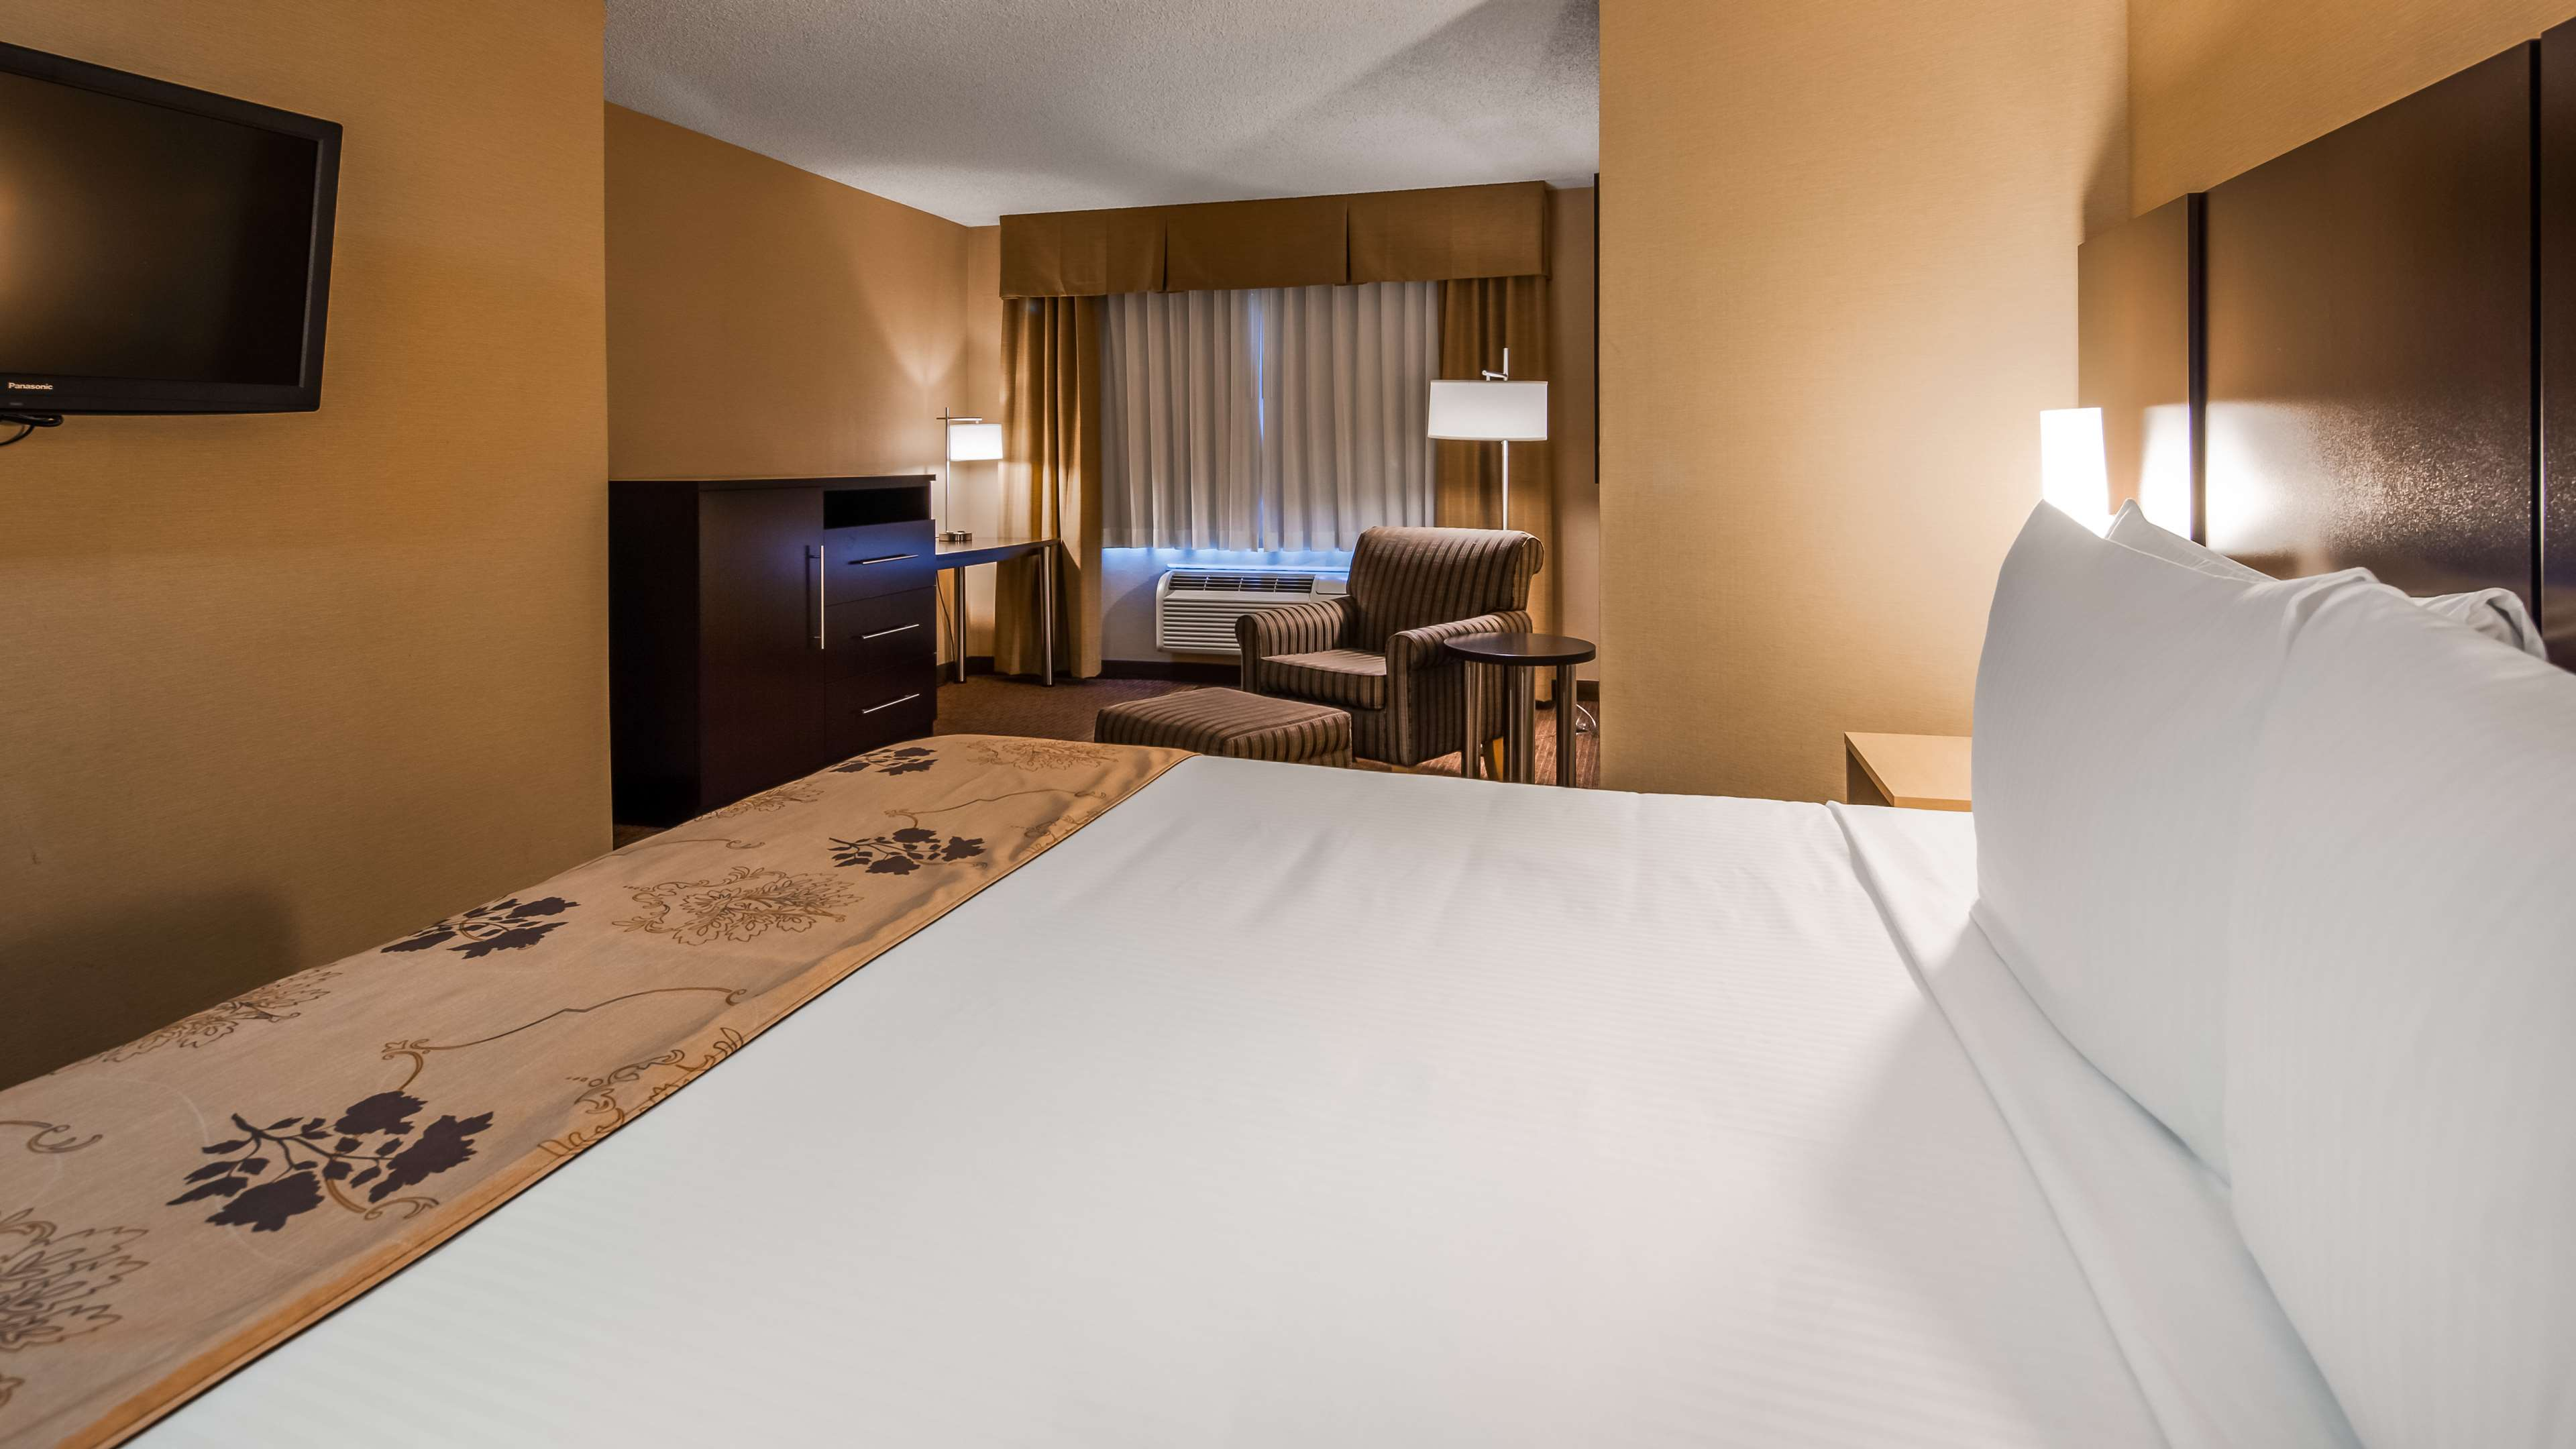 King Guest Room Best Western Seattle Airport Hotel Seattle (206)878-3300